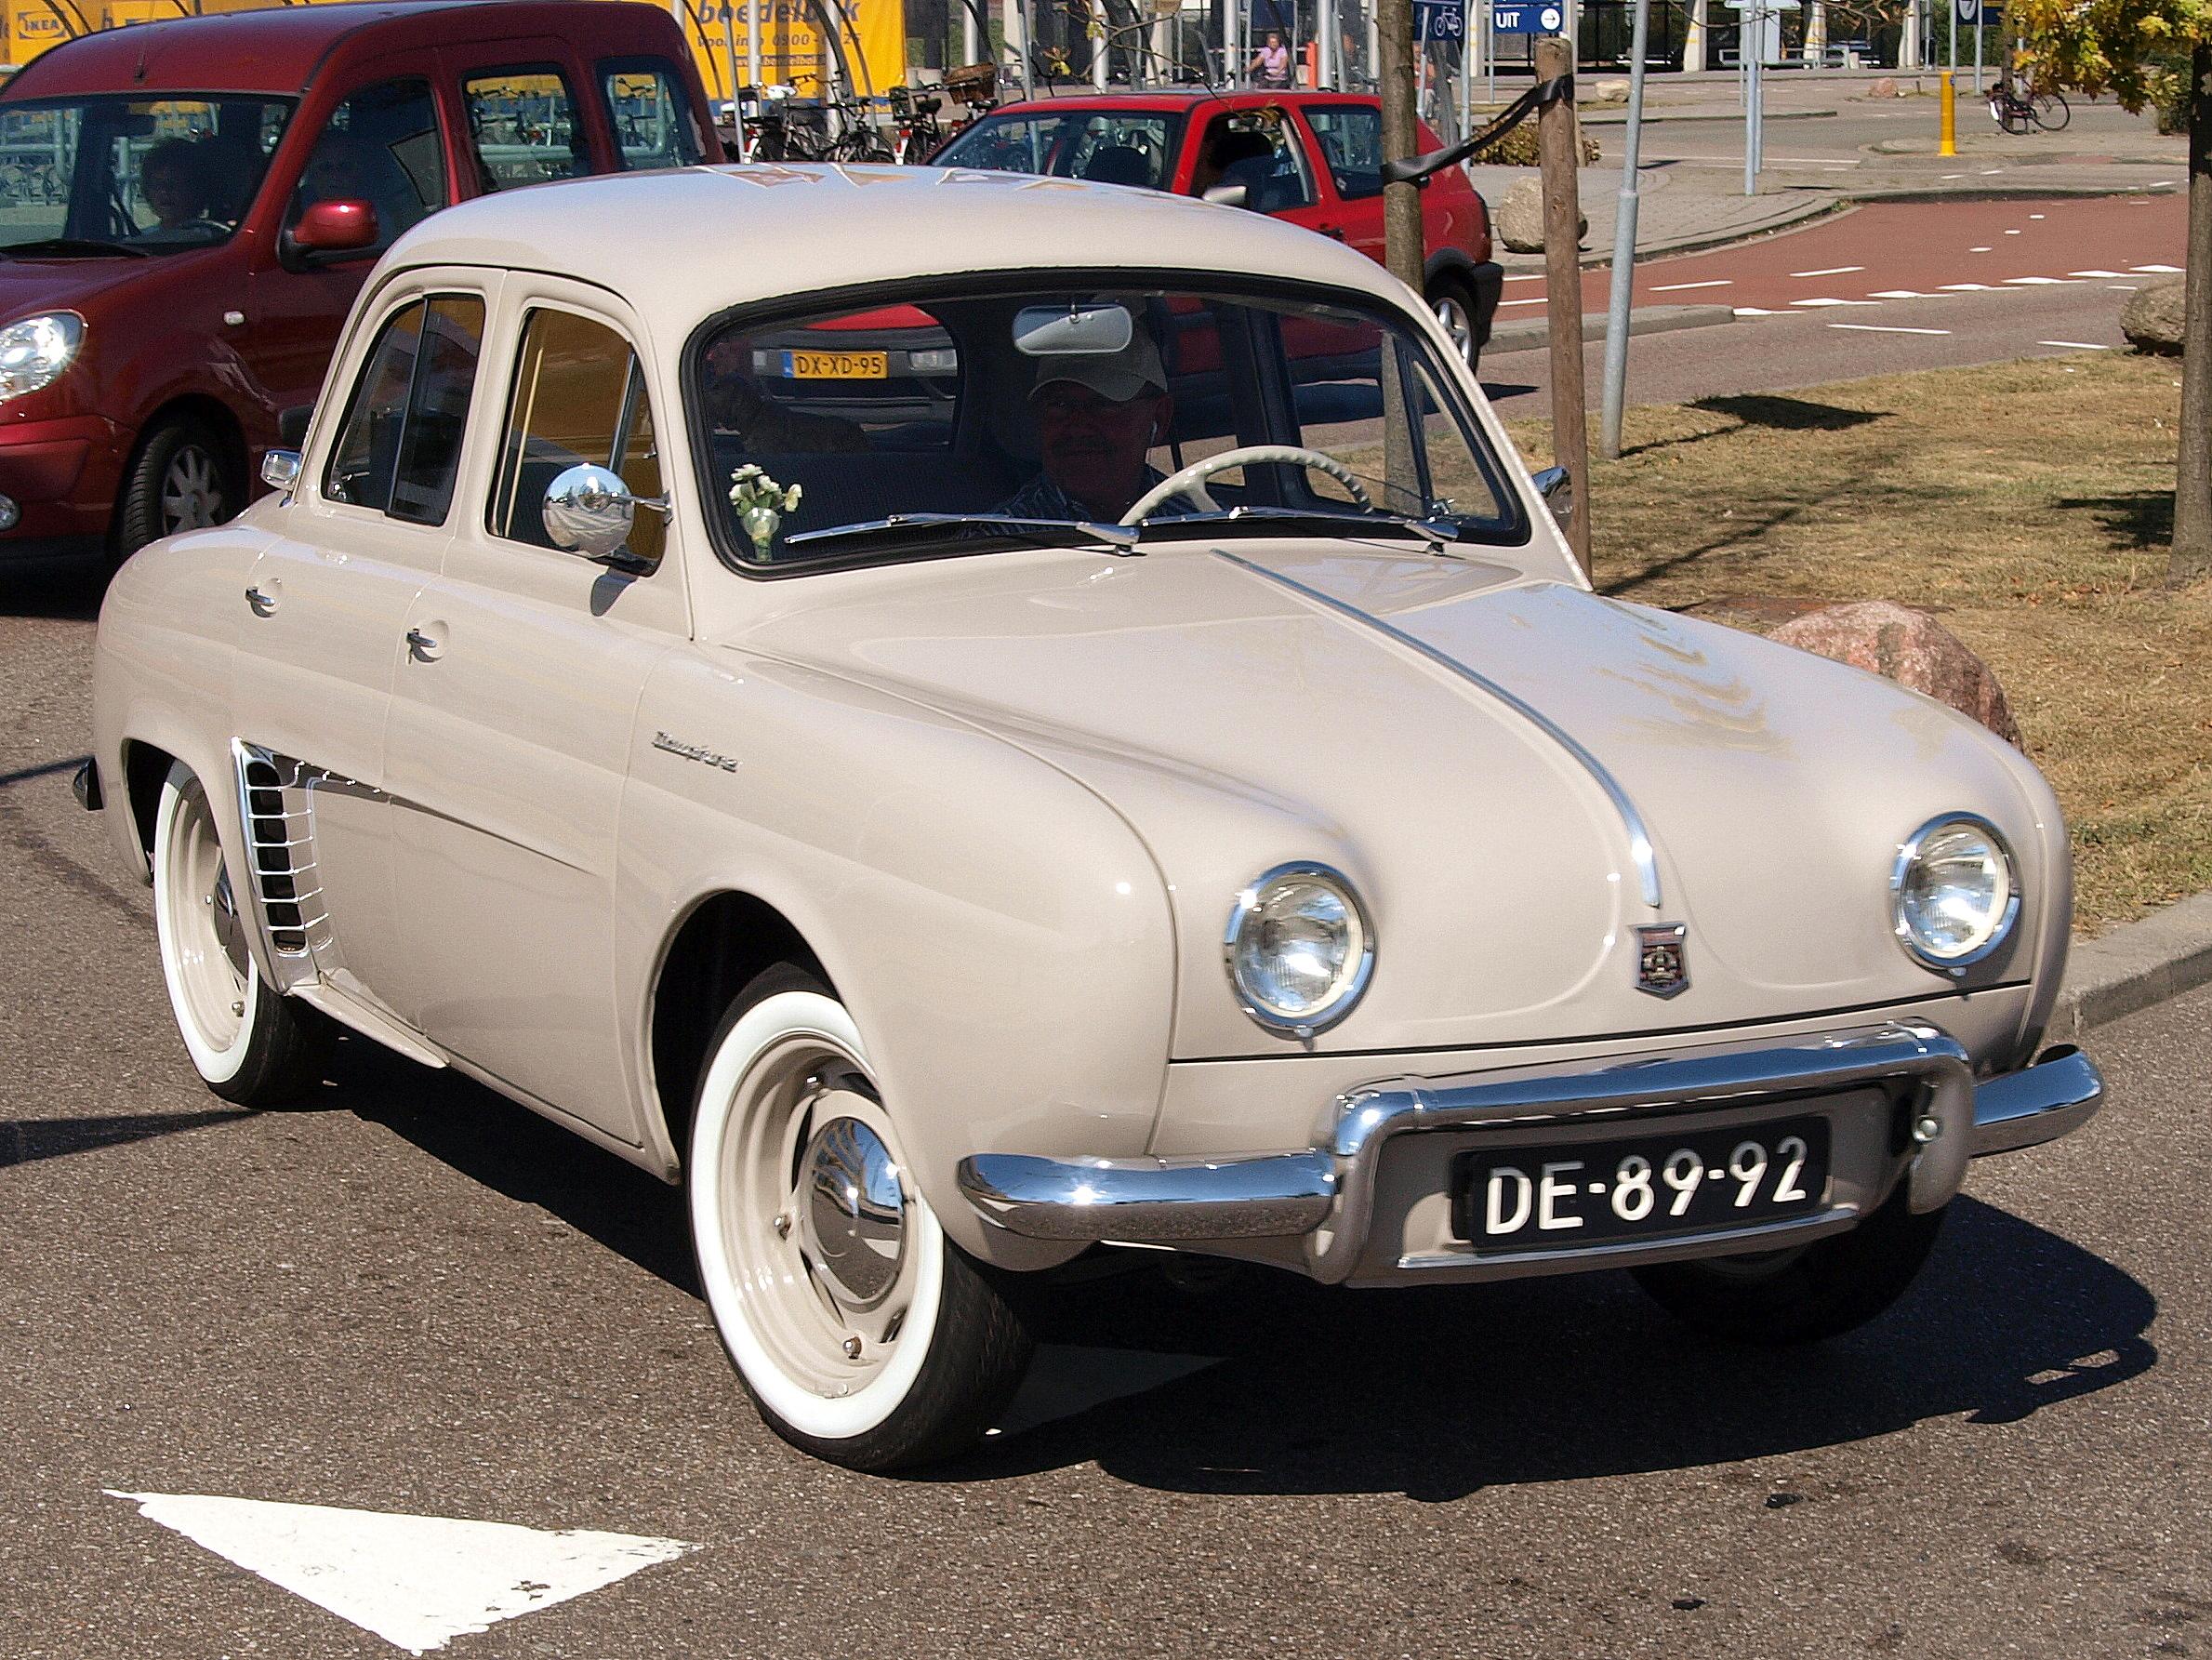 File Renault Dauphine De 89 92 Pic2 Jpg Wikimedia Commons